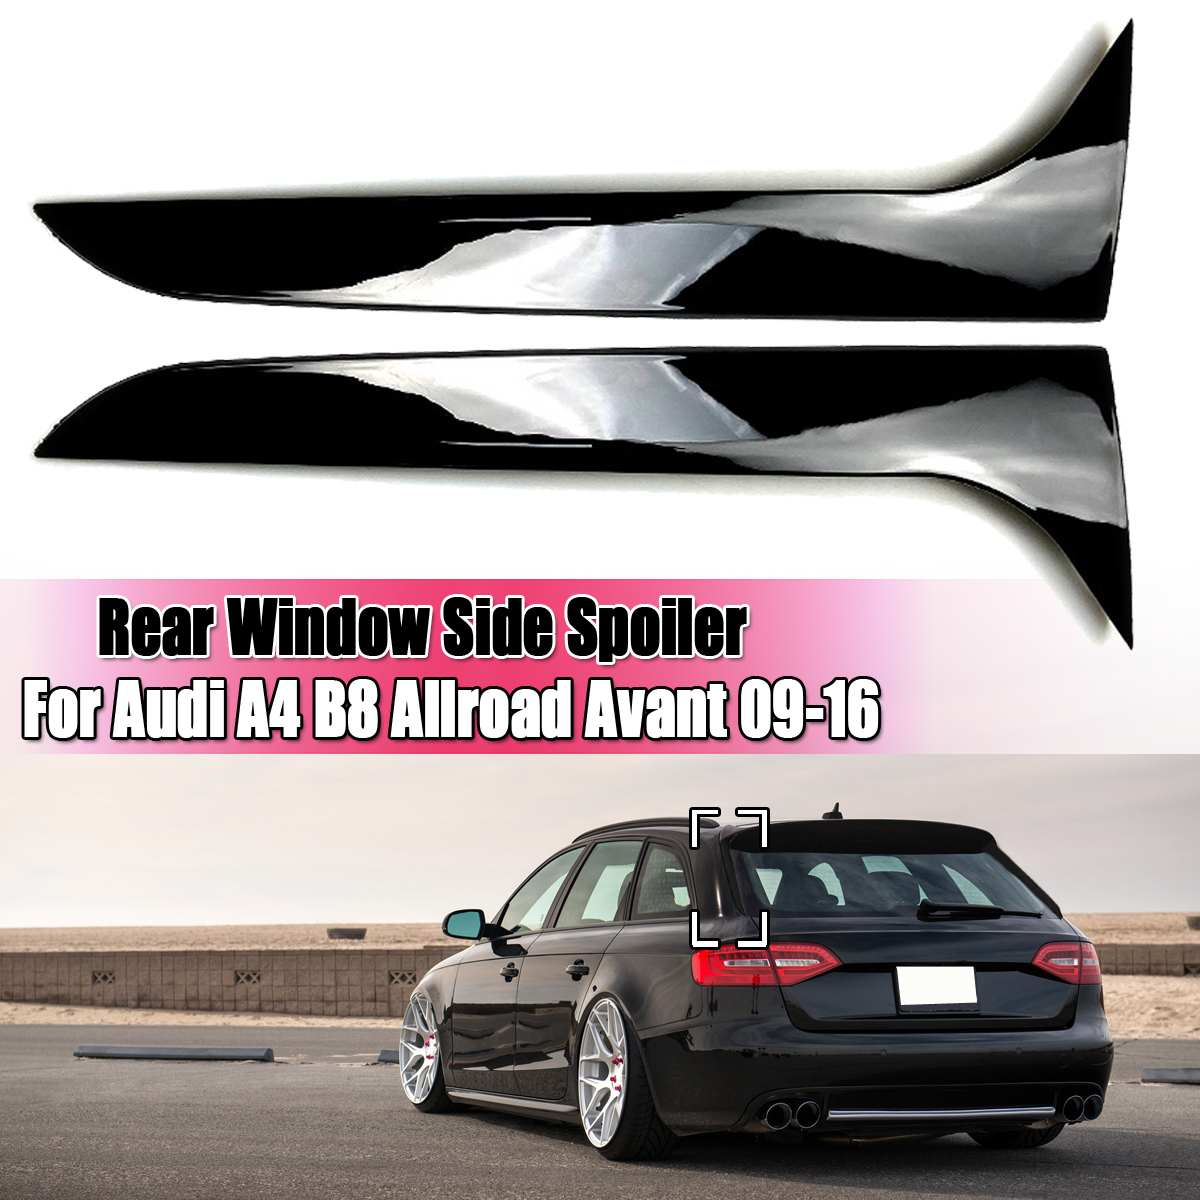 Brillo negro alerón ventana lateral trasera ala para Audi A4 B8 Allroad Avant 2009, 2010, 2011, 2012-2016 coche-estilo de accesorios para automóviles